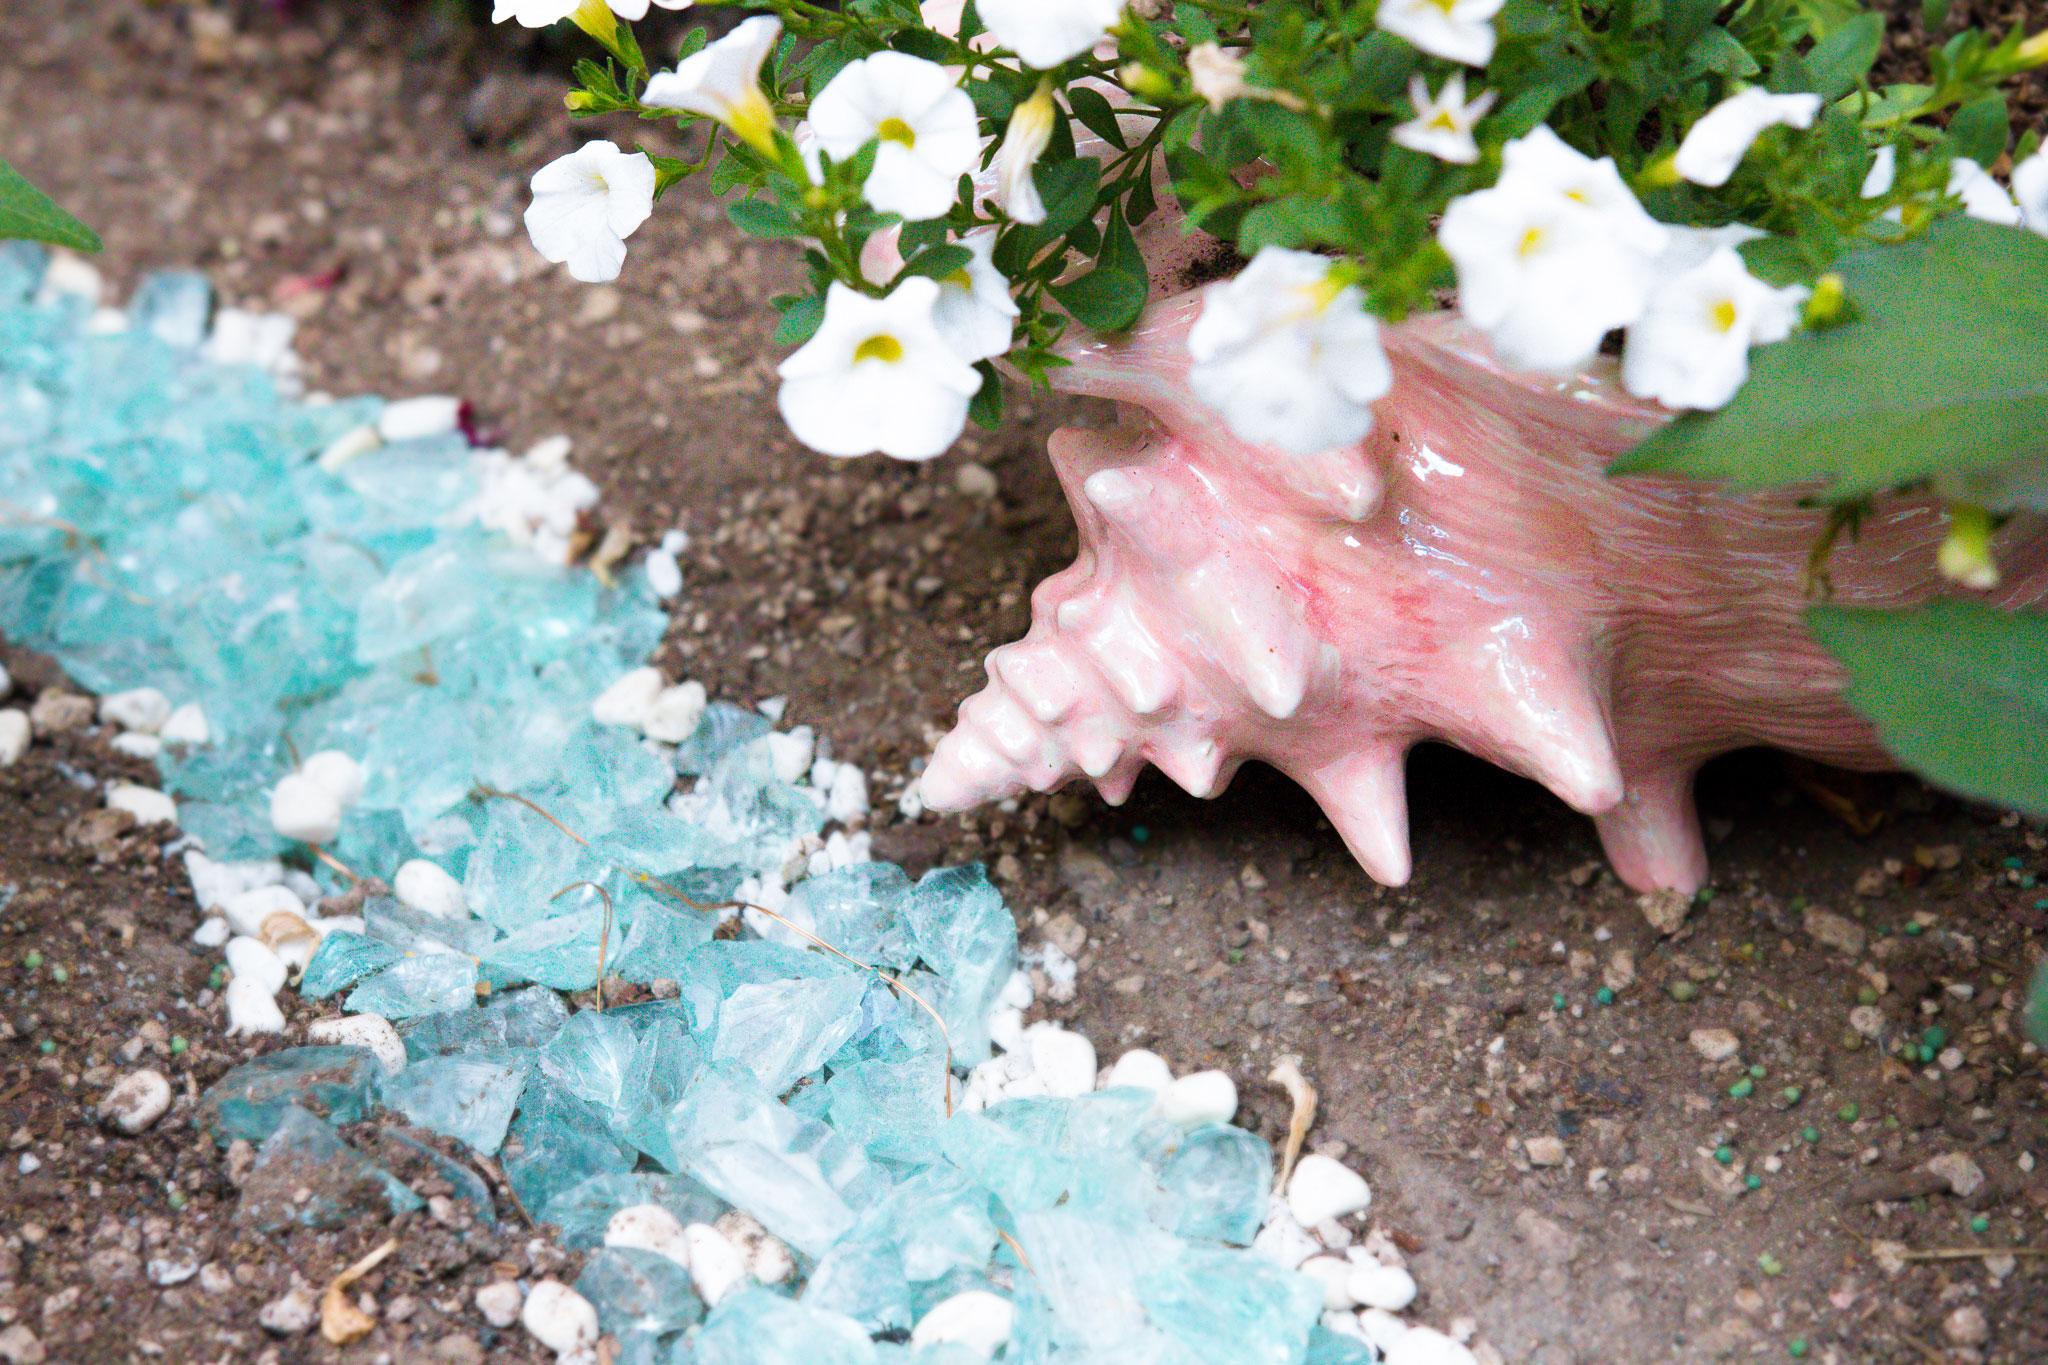 Adelya_Tumasyeva_the-garden-project_3.jpg